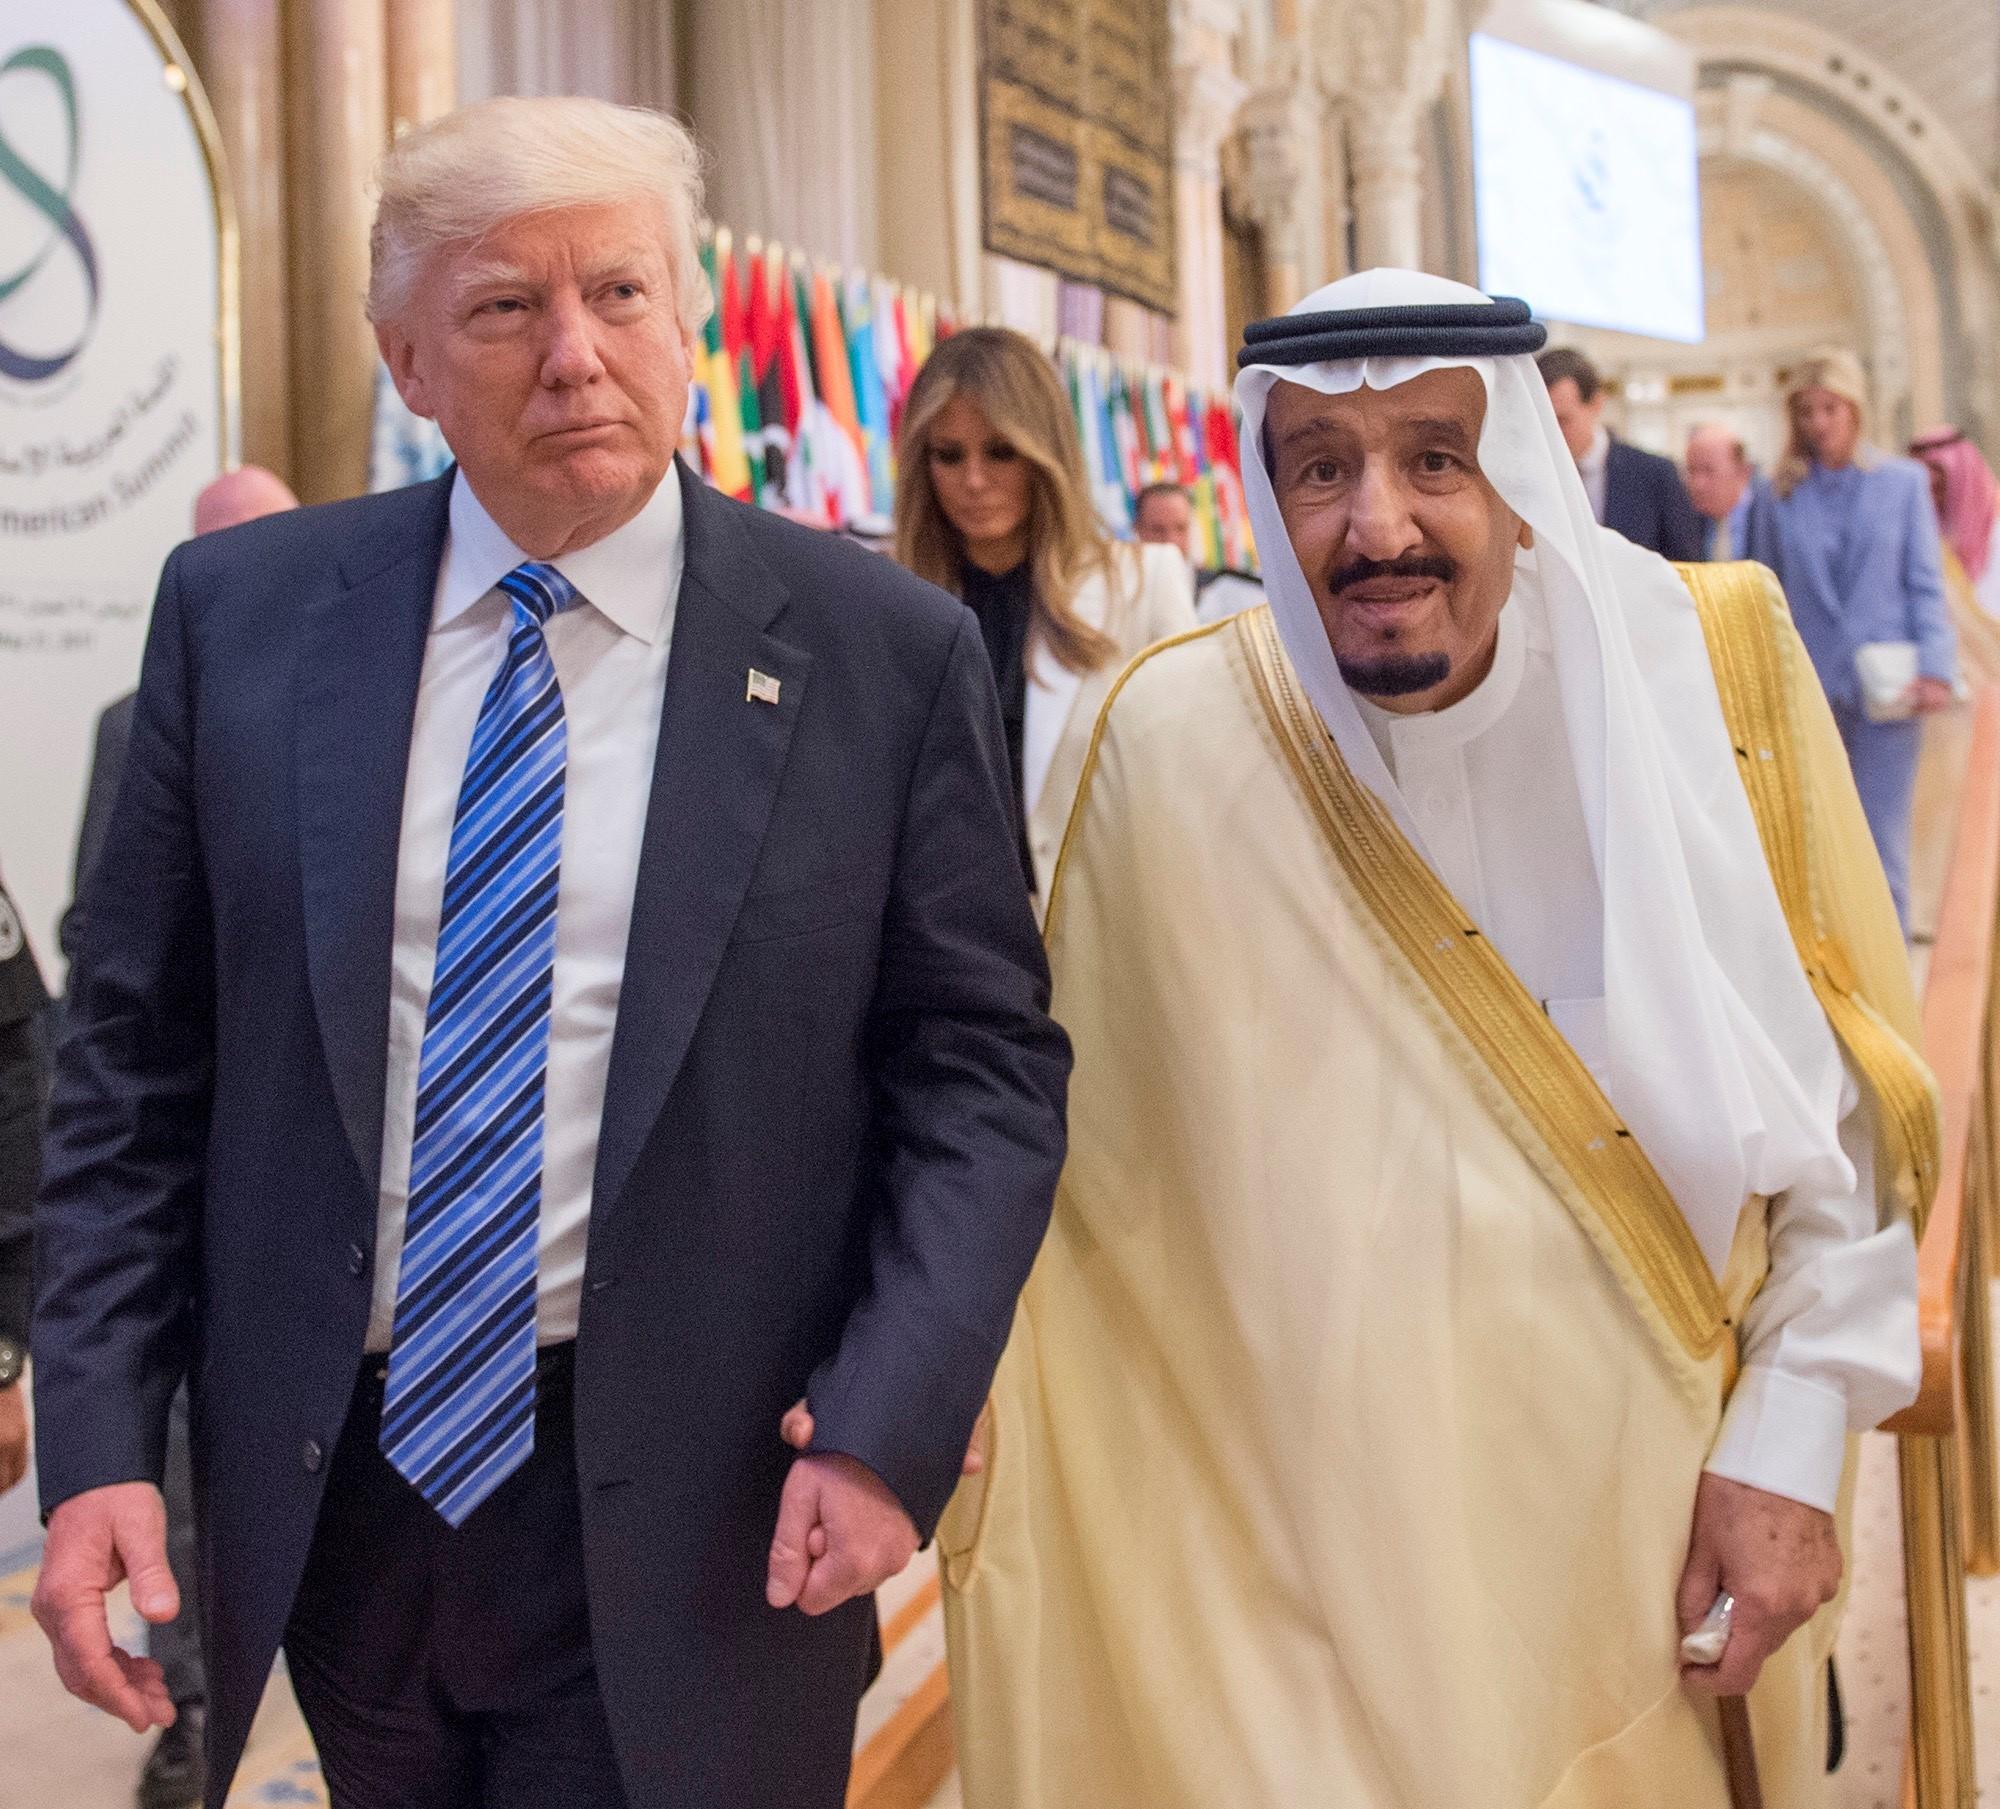 U.S. President Donald Trump (L) and Saudi Arabia's King Salman bin Abdulaziz Al Saud (R) attend the Arabic Islamic American Summit at King Abdul Aziz International Conference Center in Riyadh, Saudi Arabia on May 21, 2017.